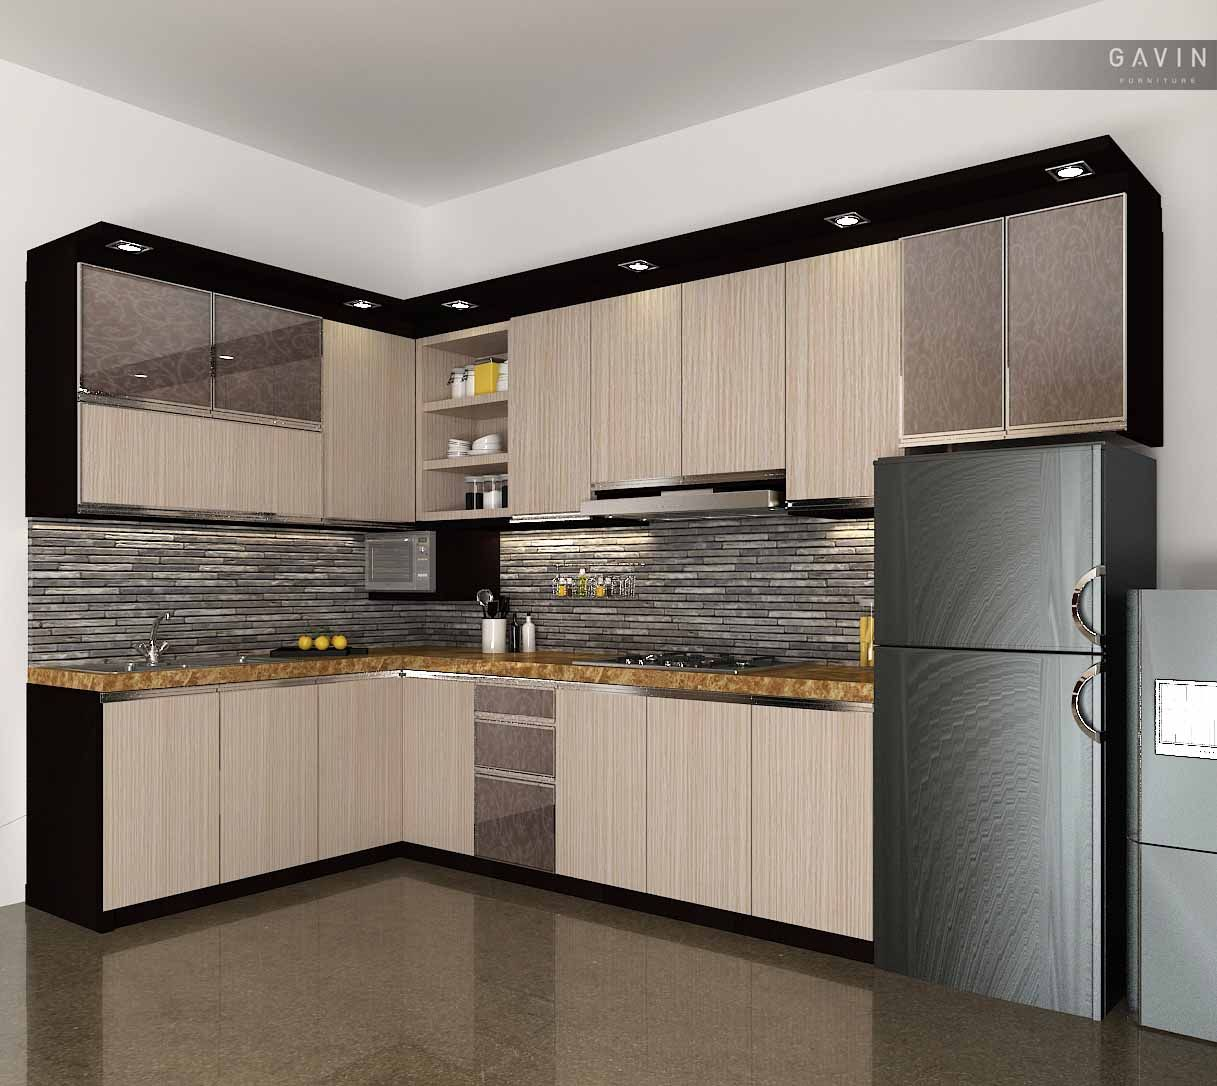 Desain Kitchen Set Minimalis Hpl Di Kemanggisan Kitchen